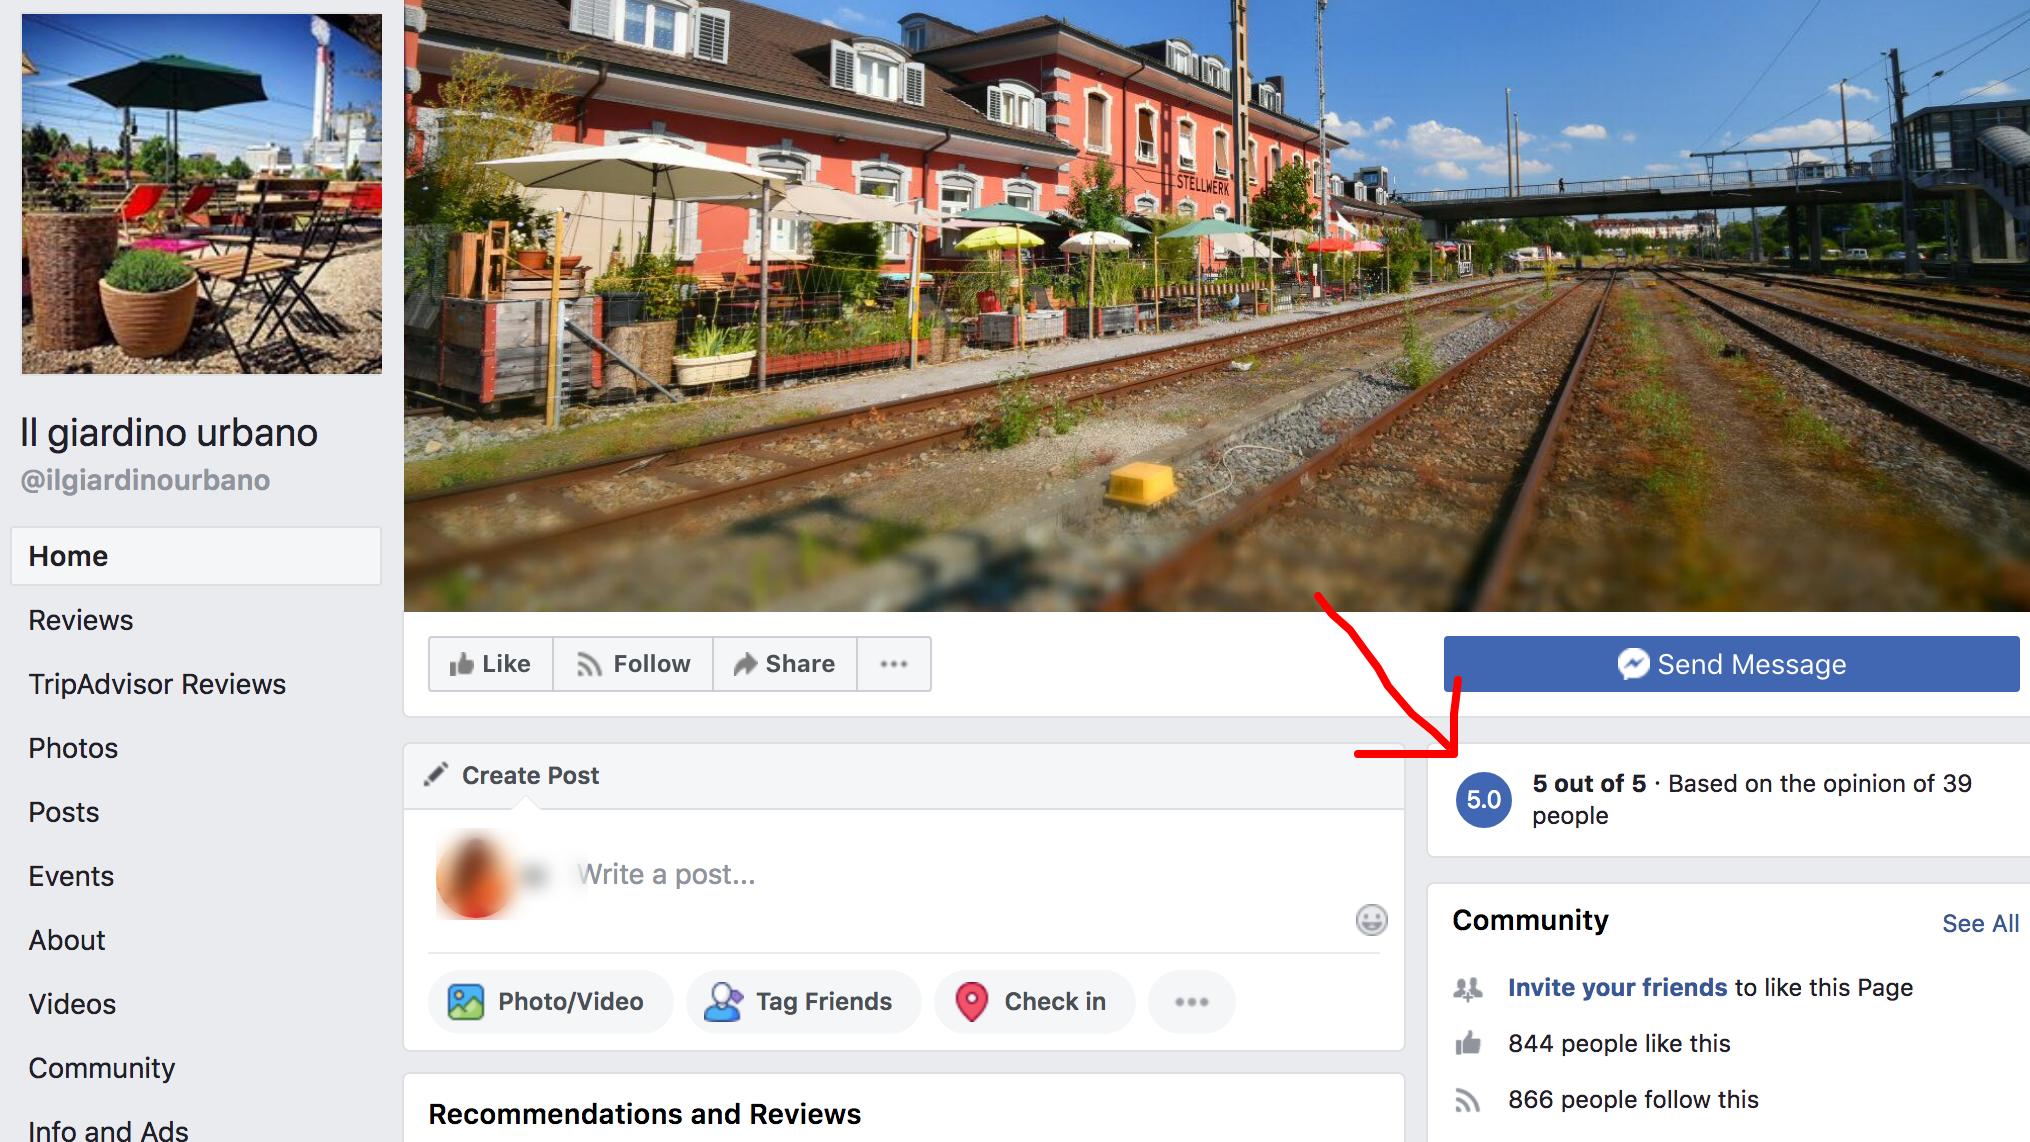 Facebook Reviews of  Pizzeria Il Giardino Urbano in Basel